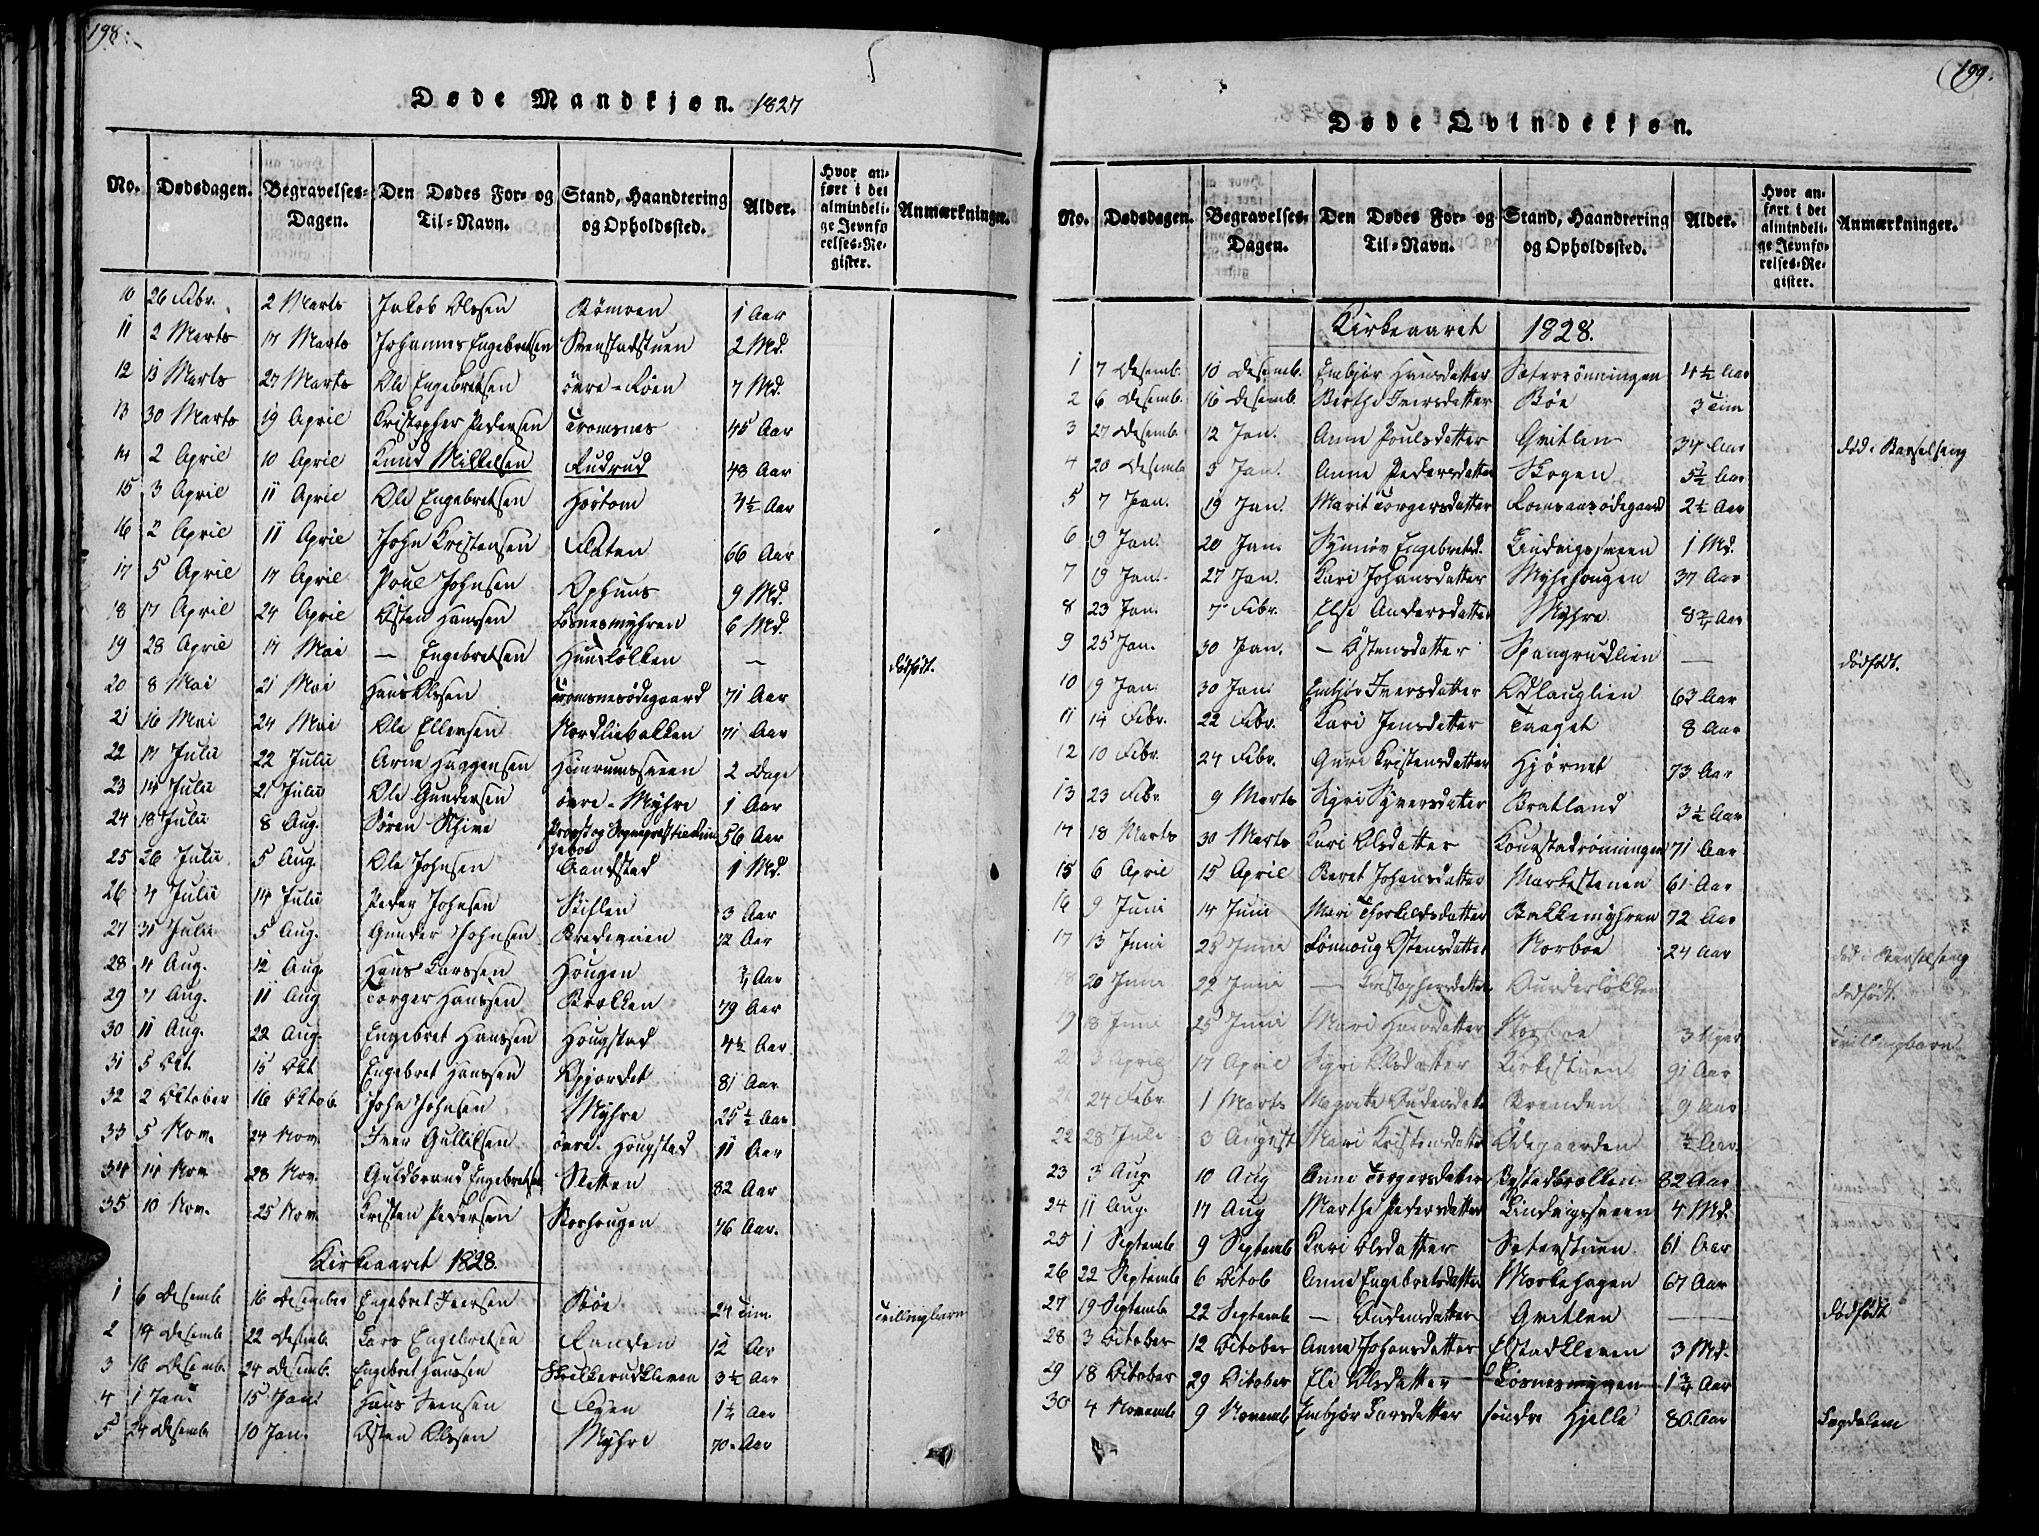 SAH, Ringebu prestekontor, Ministerialbok nr. 4, 1821-1839, s. 198-199